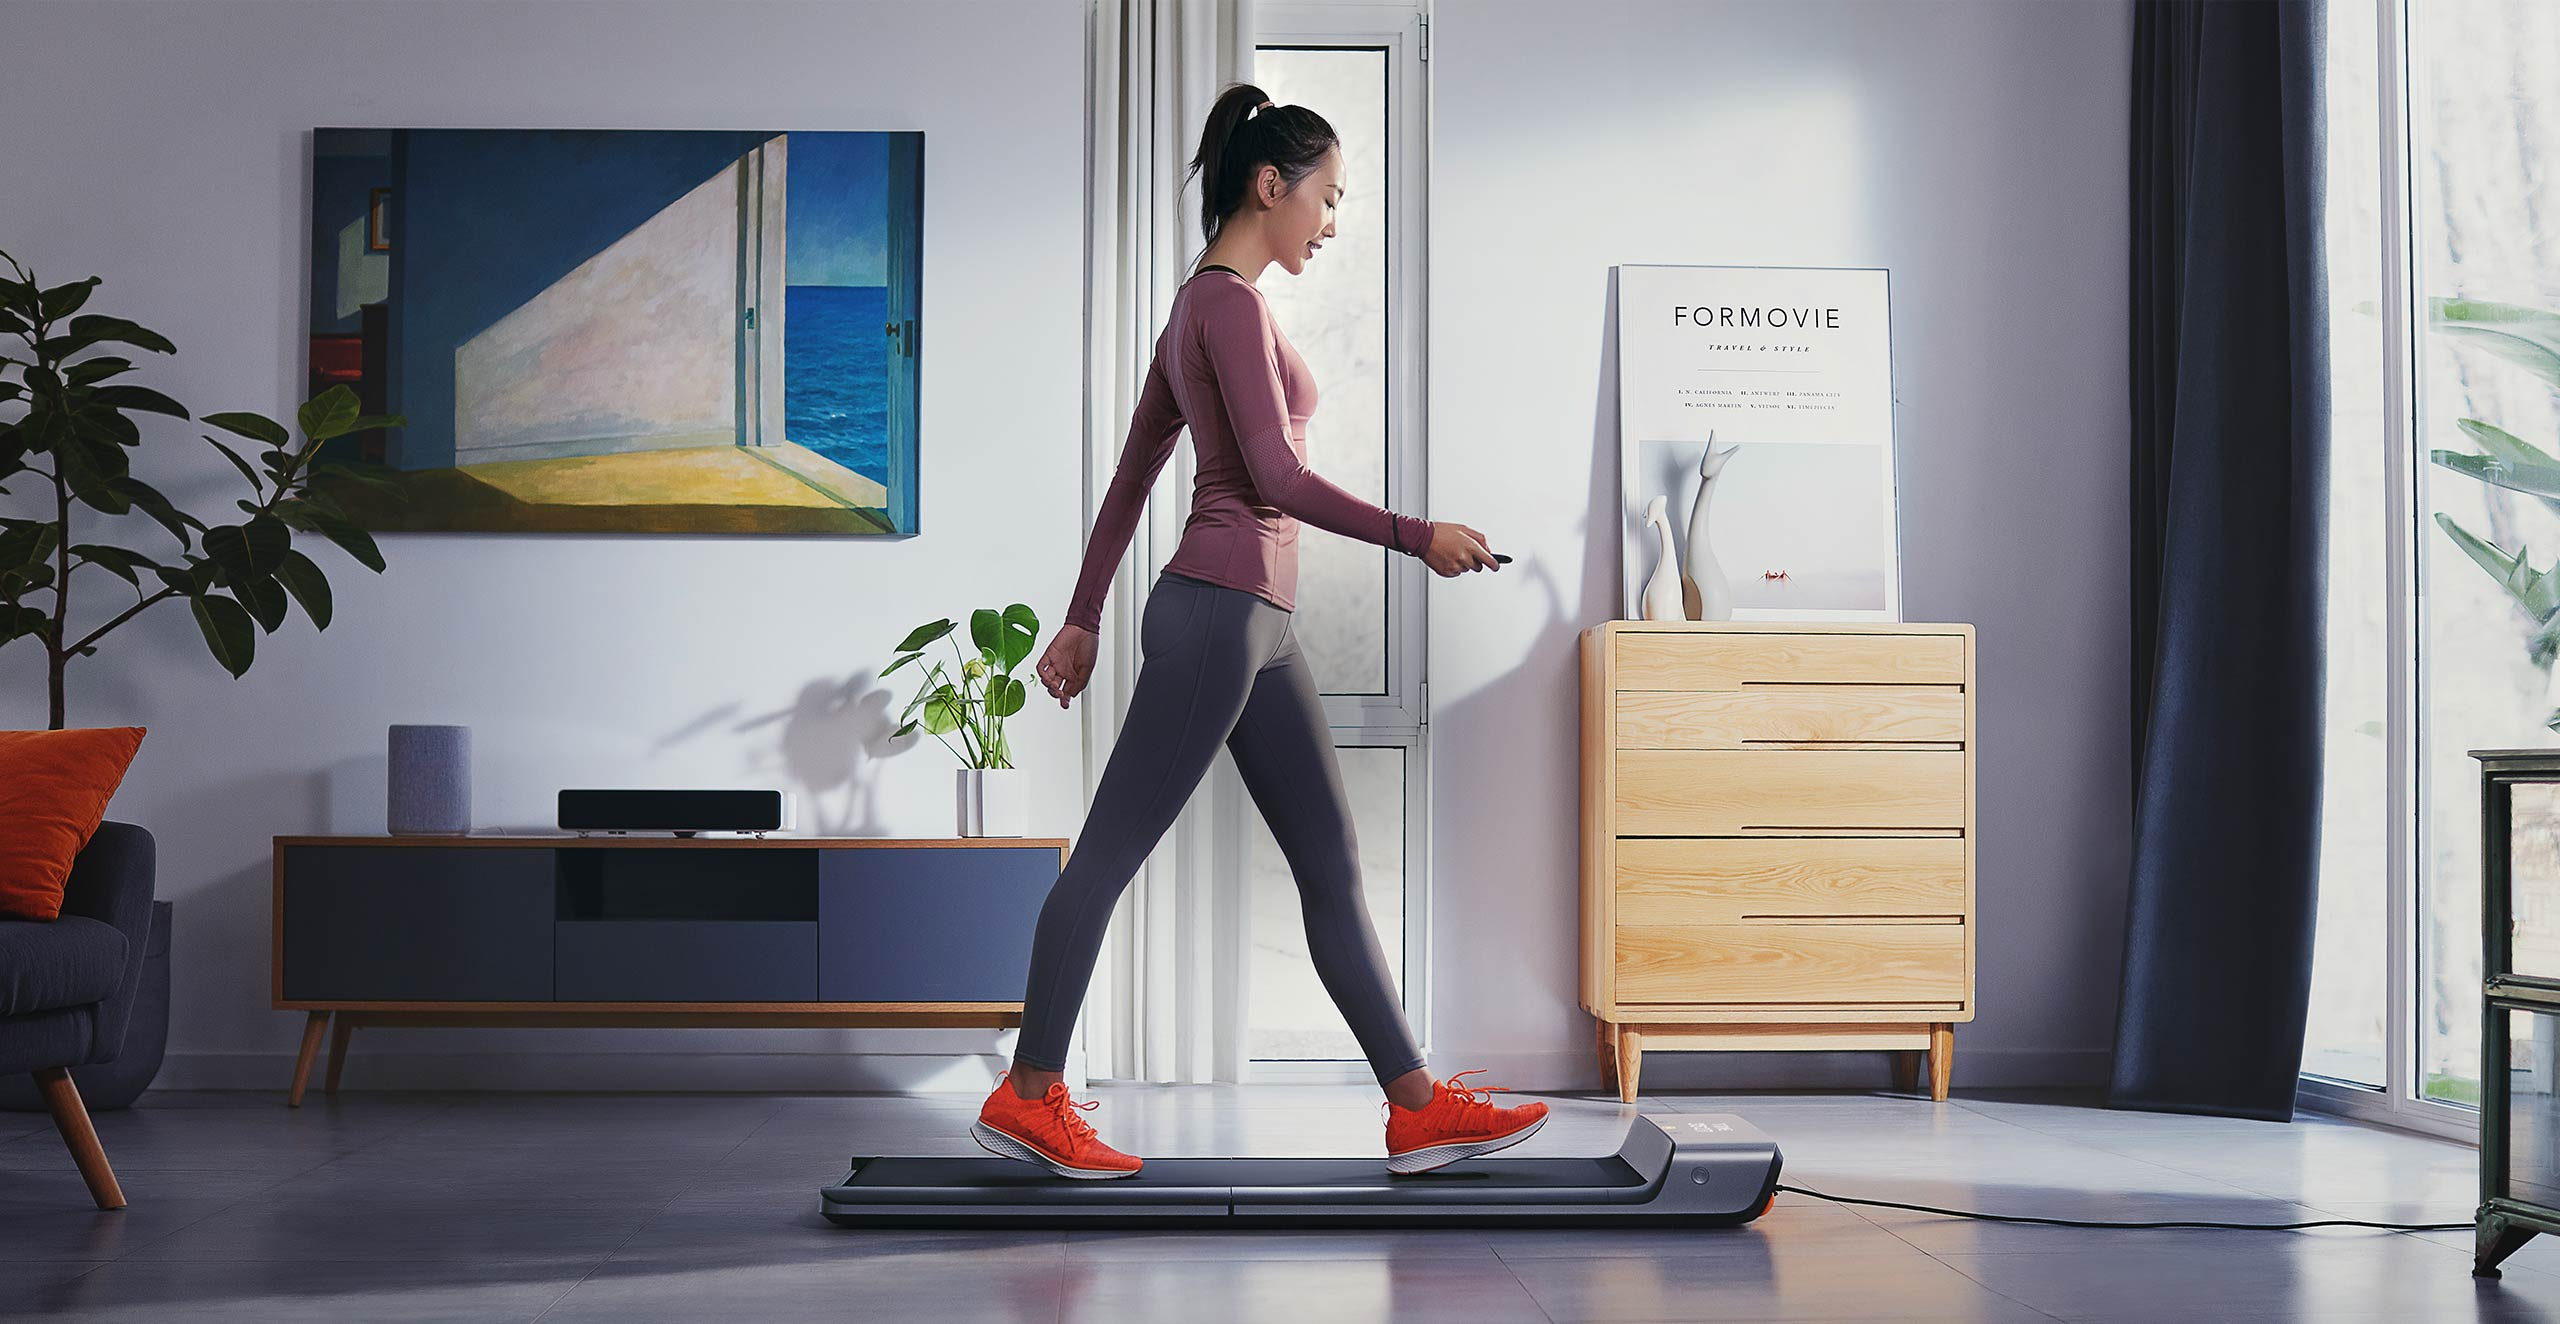 Xiaomi Mijia WalkingPad walking Machine Foldable Household Non-flat  Treadmill Smart Control of Speed Connect Smart Mi Home App